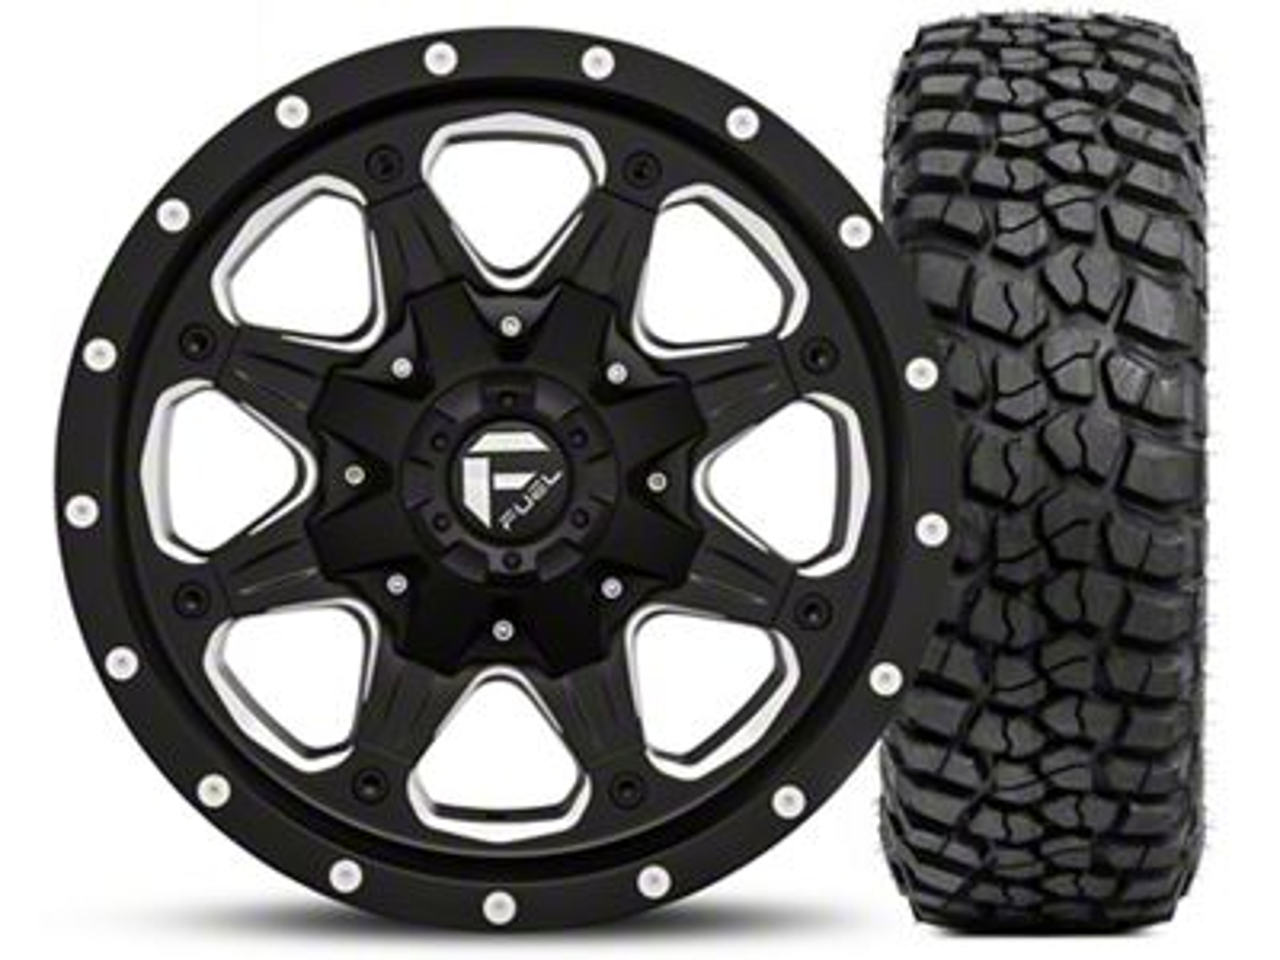 Fuel Wheels Boost Black/Milled 16x8 Wheel - and BF Goodrich Mud Terrain T/A KM2 315/75R16 Kit (07-18 Jeep Wrangler JK; 2018 Jeep Wrangler JL)